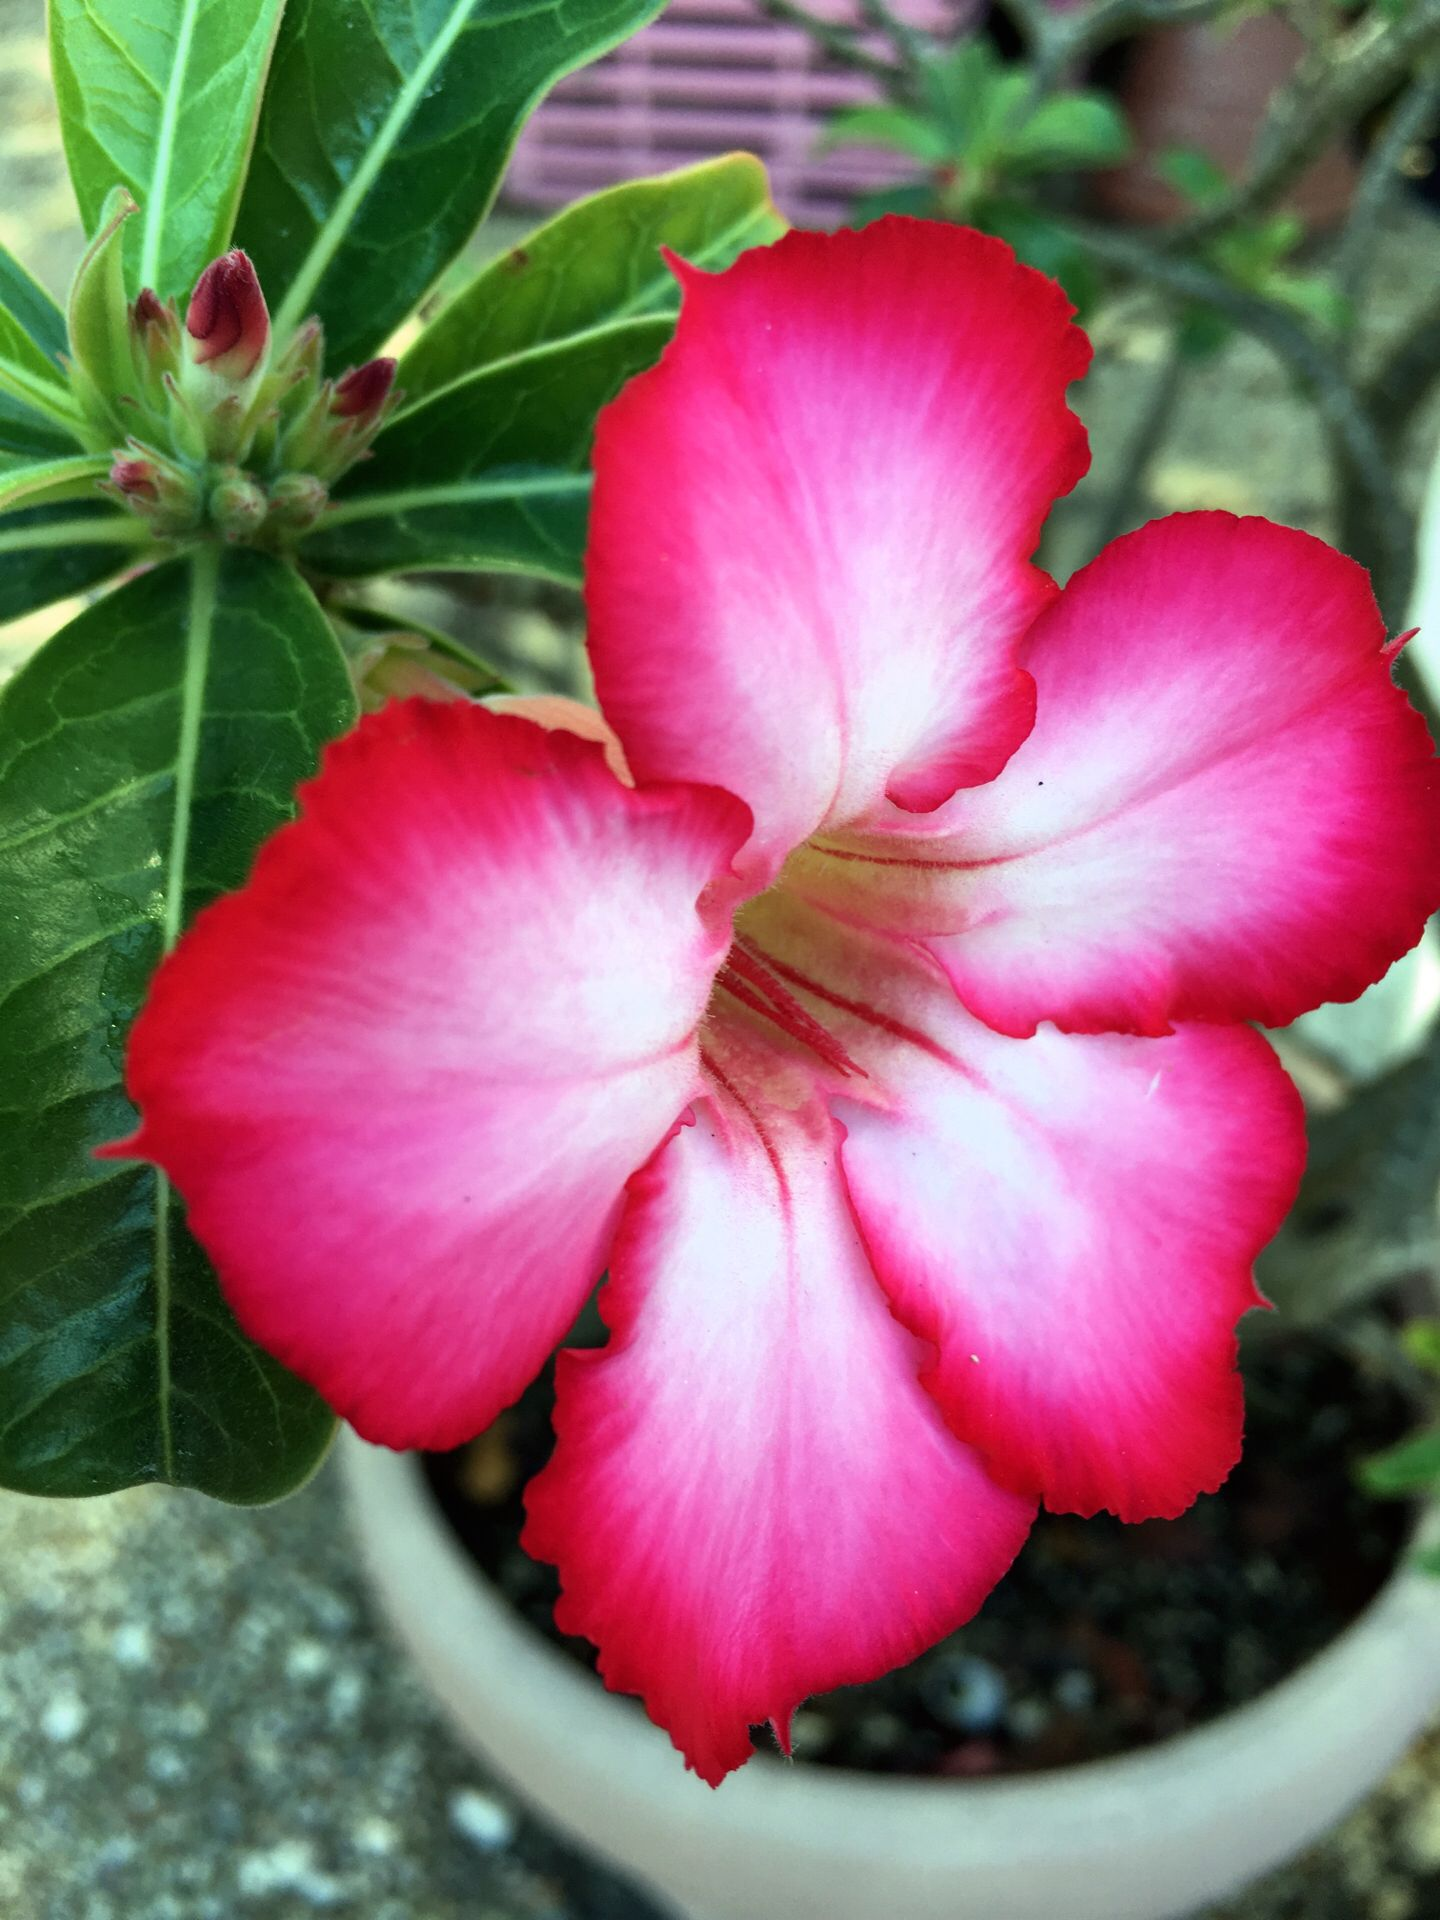 My pics of beautiful tropical flowers here on islamorada in the my pics of beautiful tropical flowers here on islamorada in the keys of florida izmirmasajfo